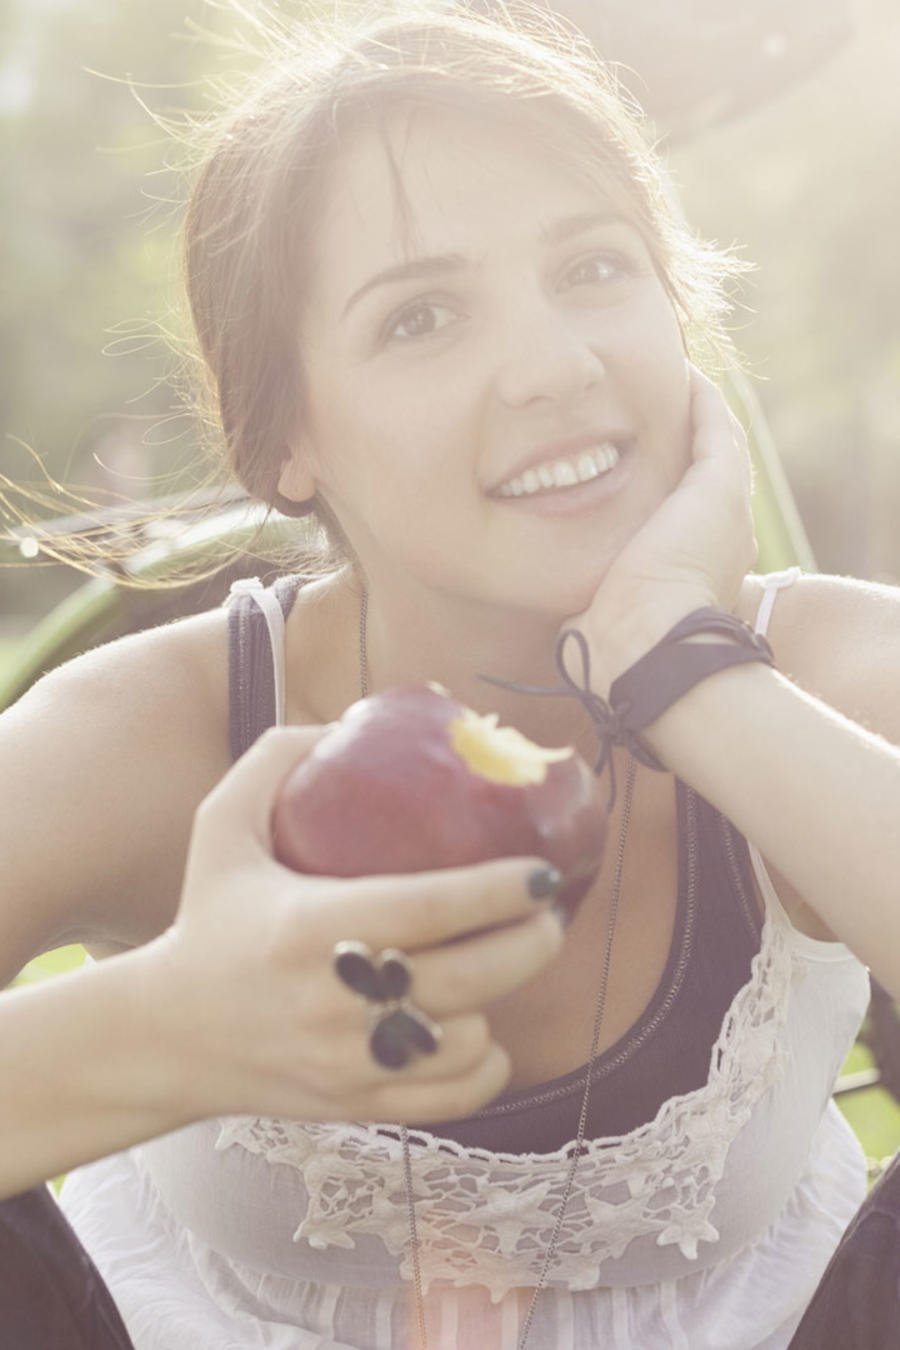 Mujer comiendo una manazana al aire libre